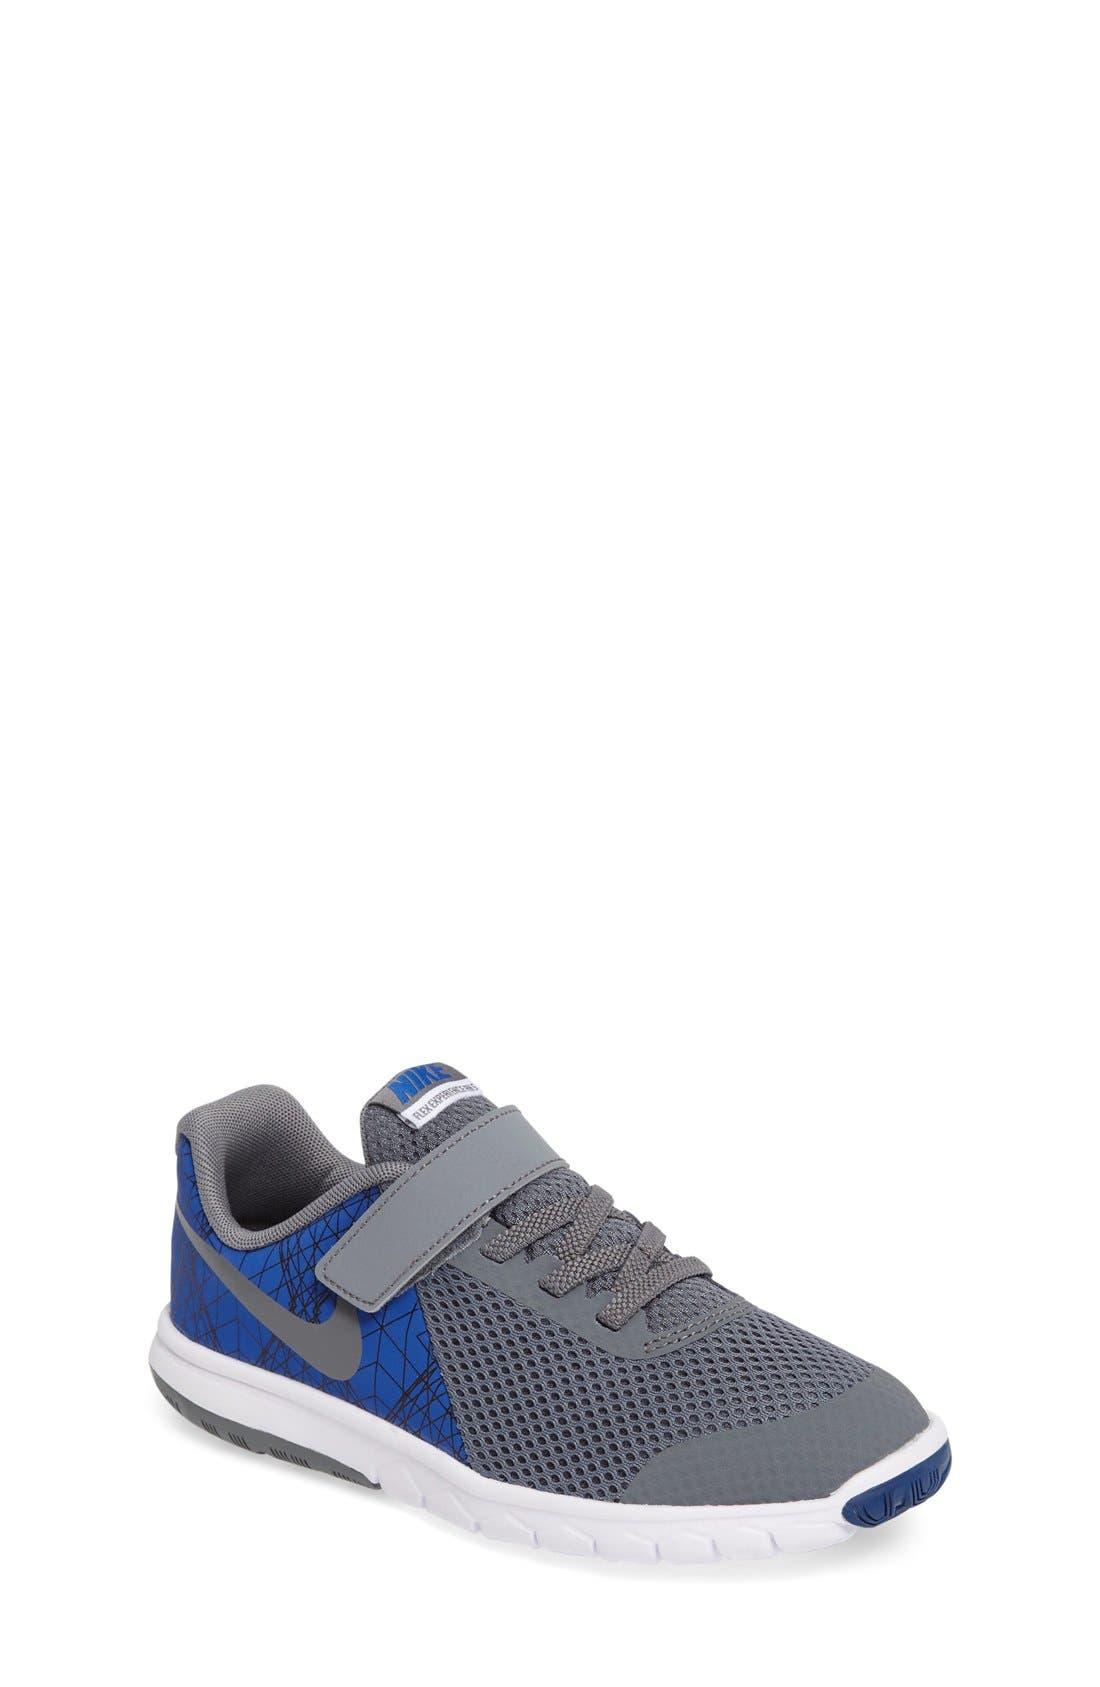 Alternate Image 1 Selected - Nike 'Flex Experience 5 Print' Running Shoe (Toddler & Little Kid)